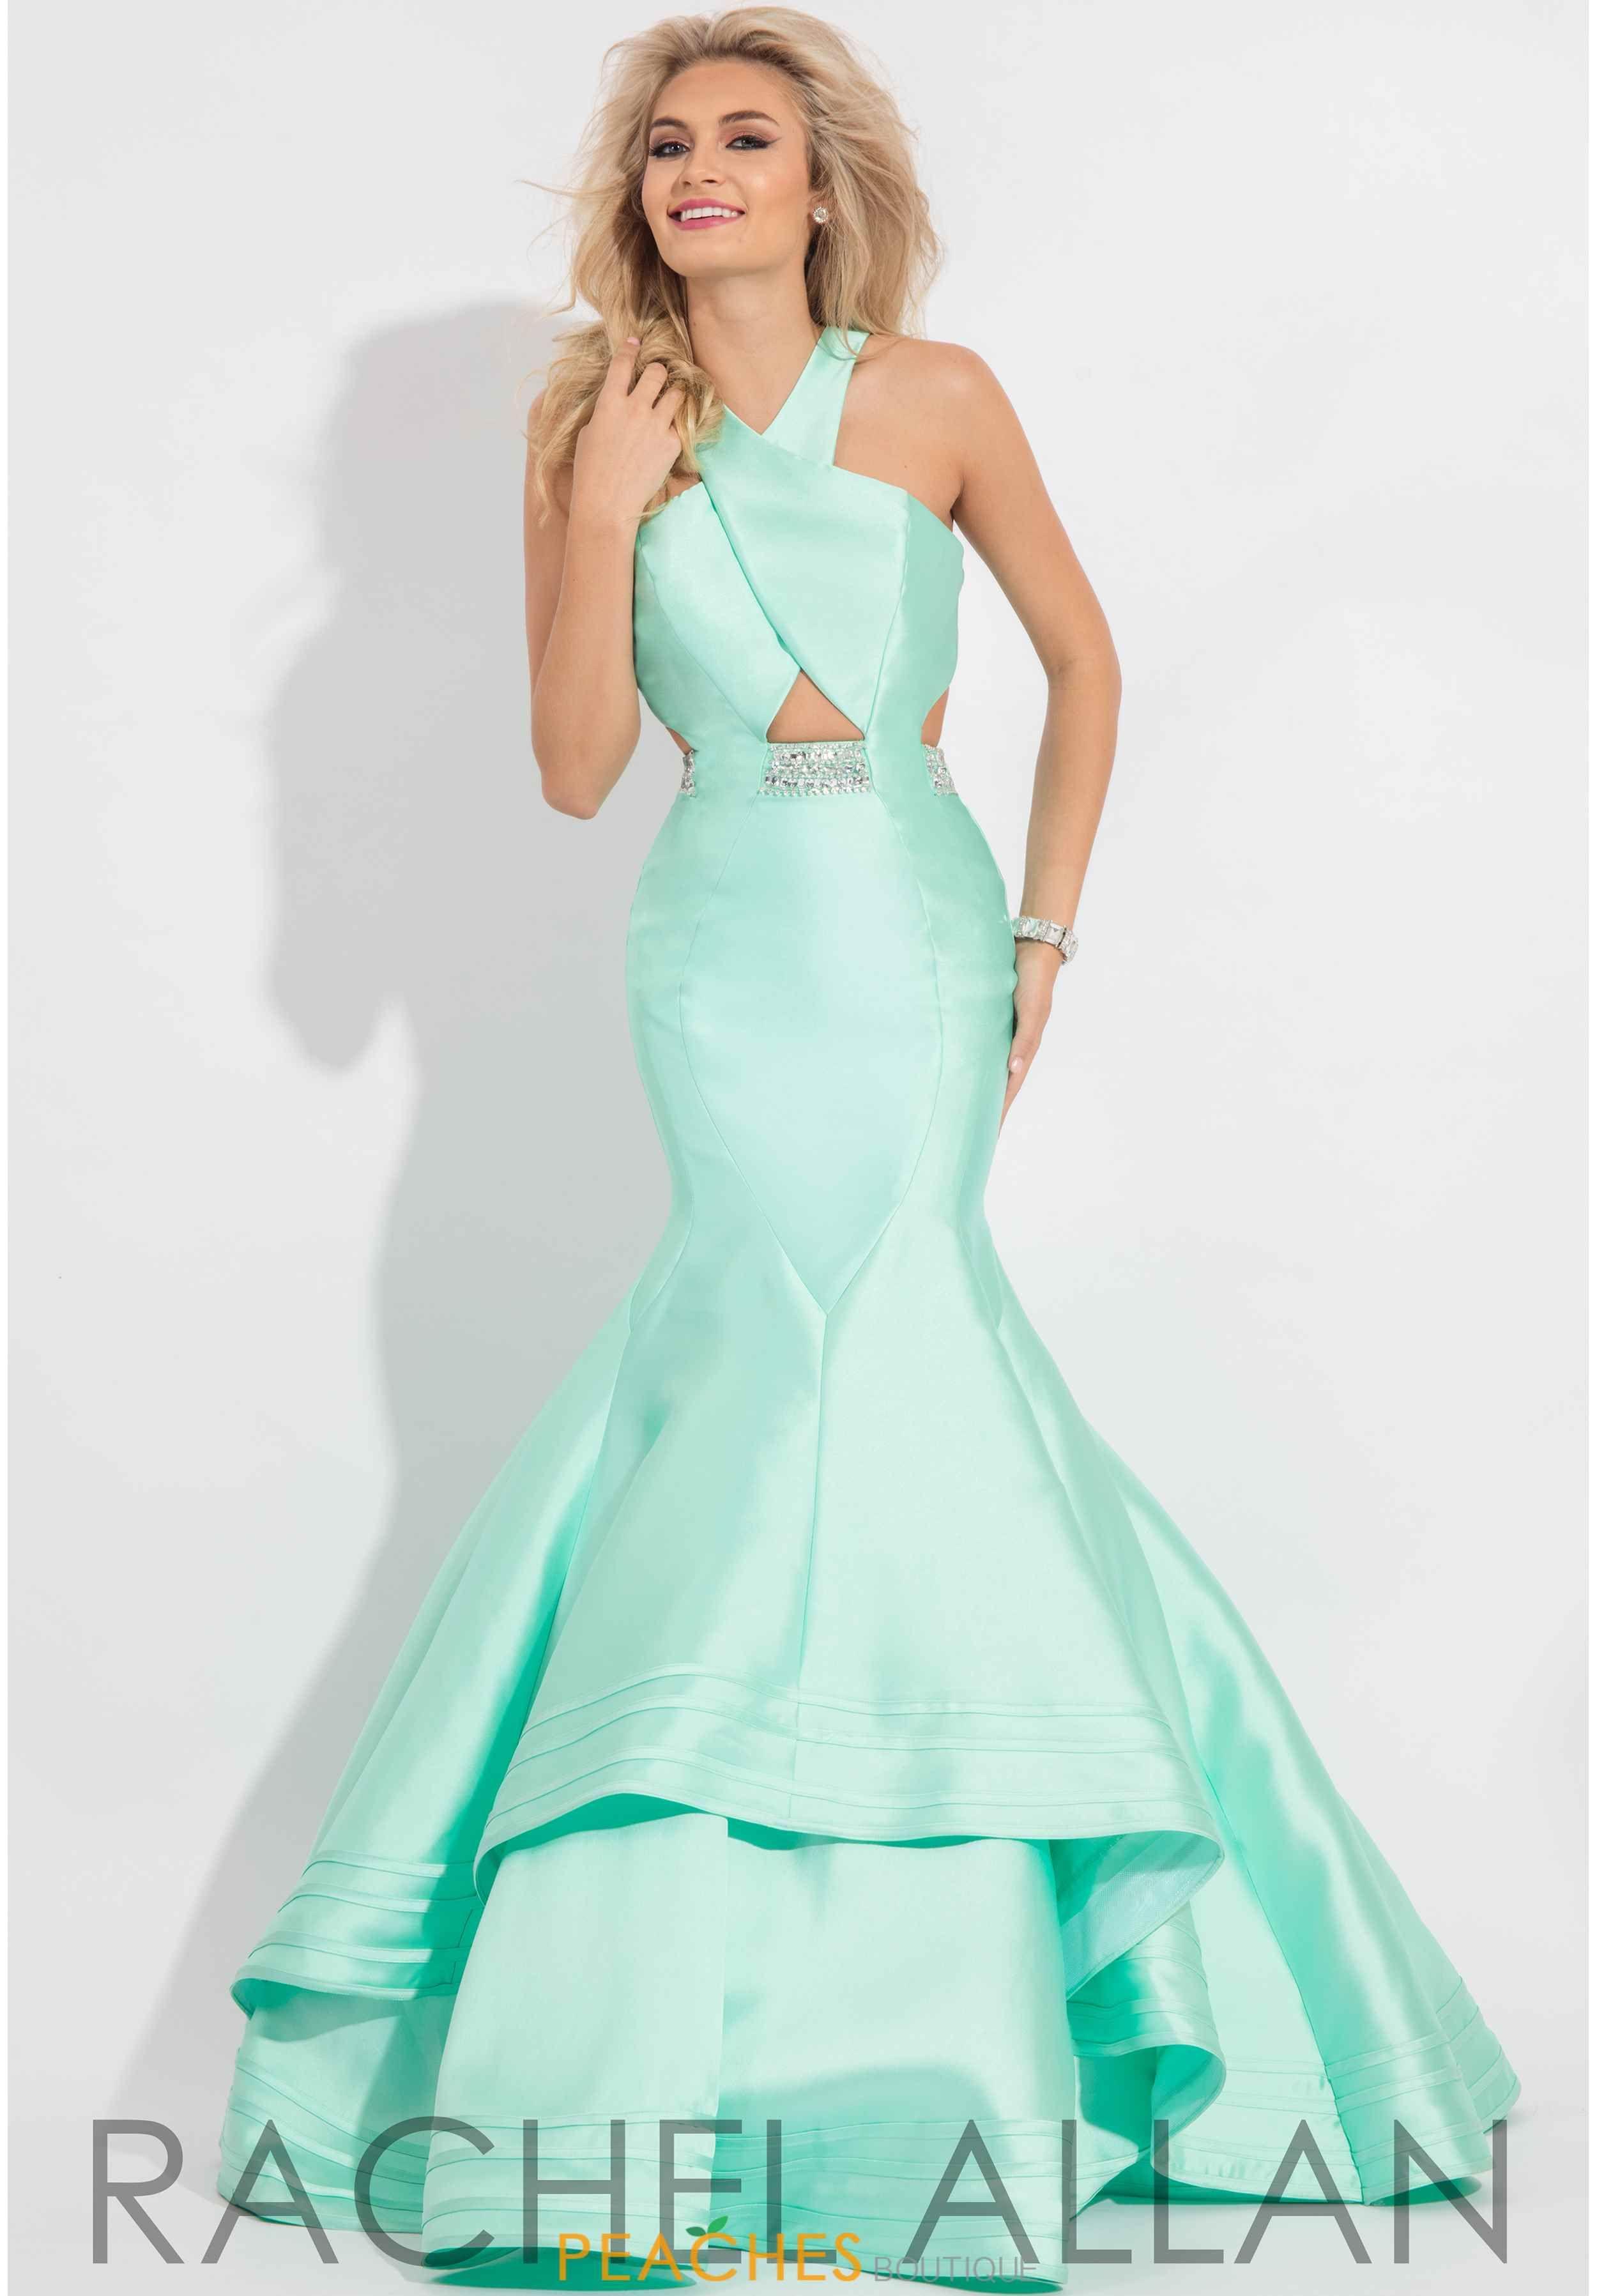 Rachel Allan Mermaid Red Beaded Dress 7593   Prom 2017   Pinterest ...